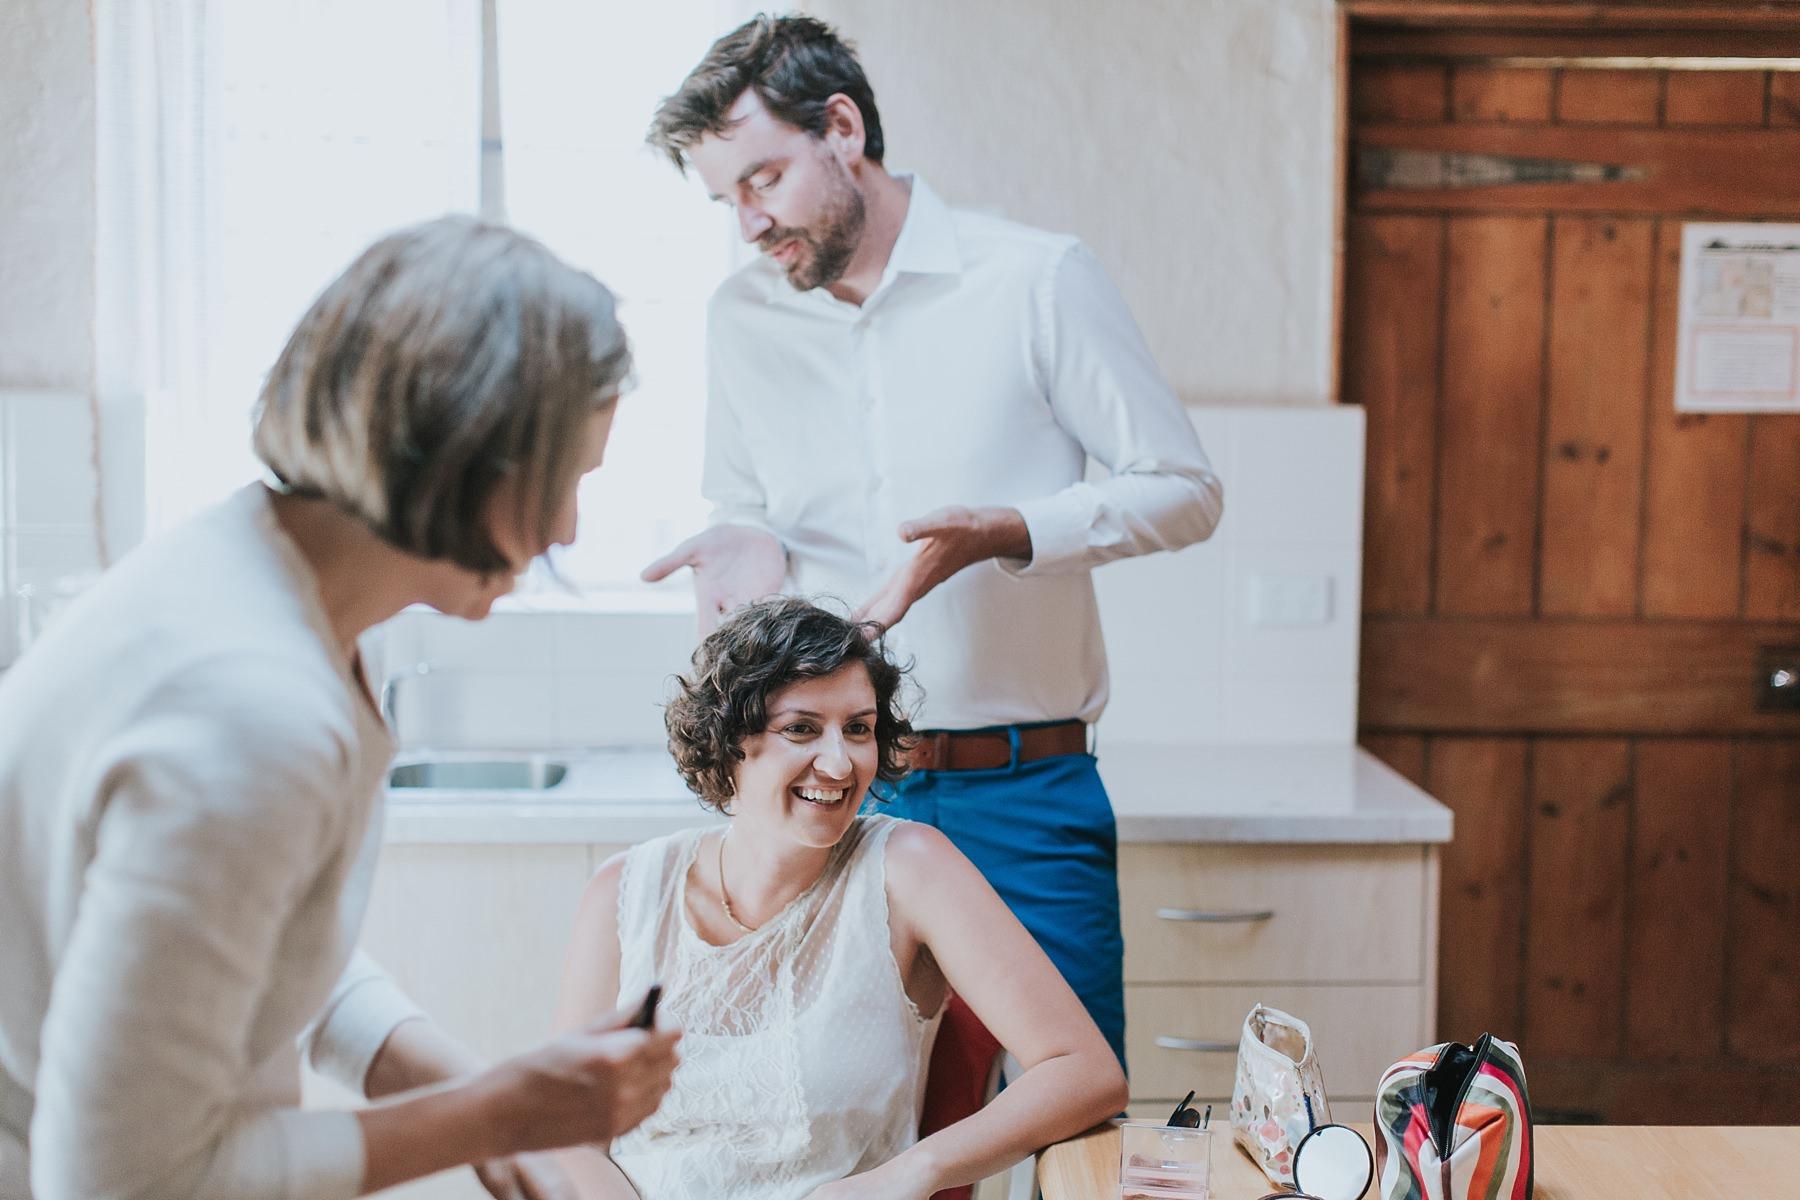 bridal hair and makeup preparations